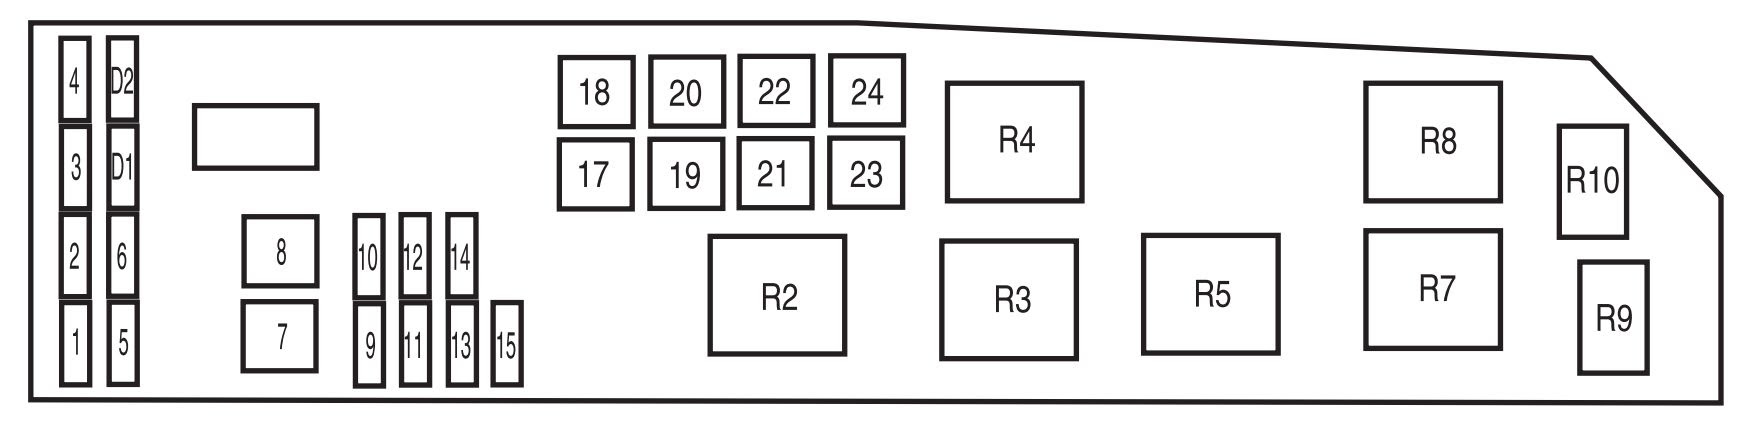 Mazda Tribute Diagram Best Wiring Diagrams Mine Asset A Mine Asset A Ekoegur Es